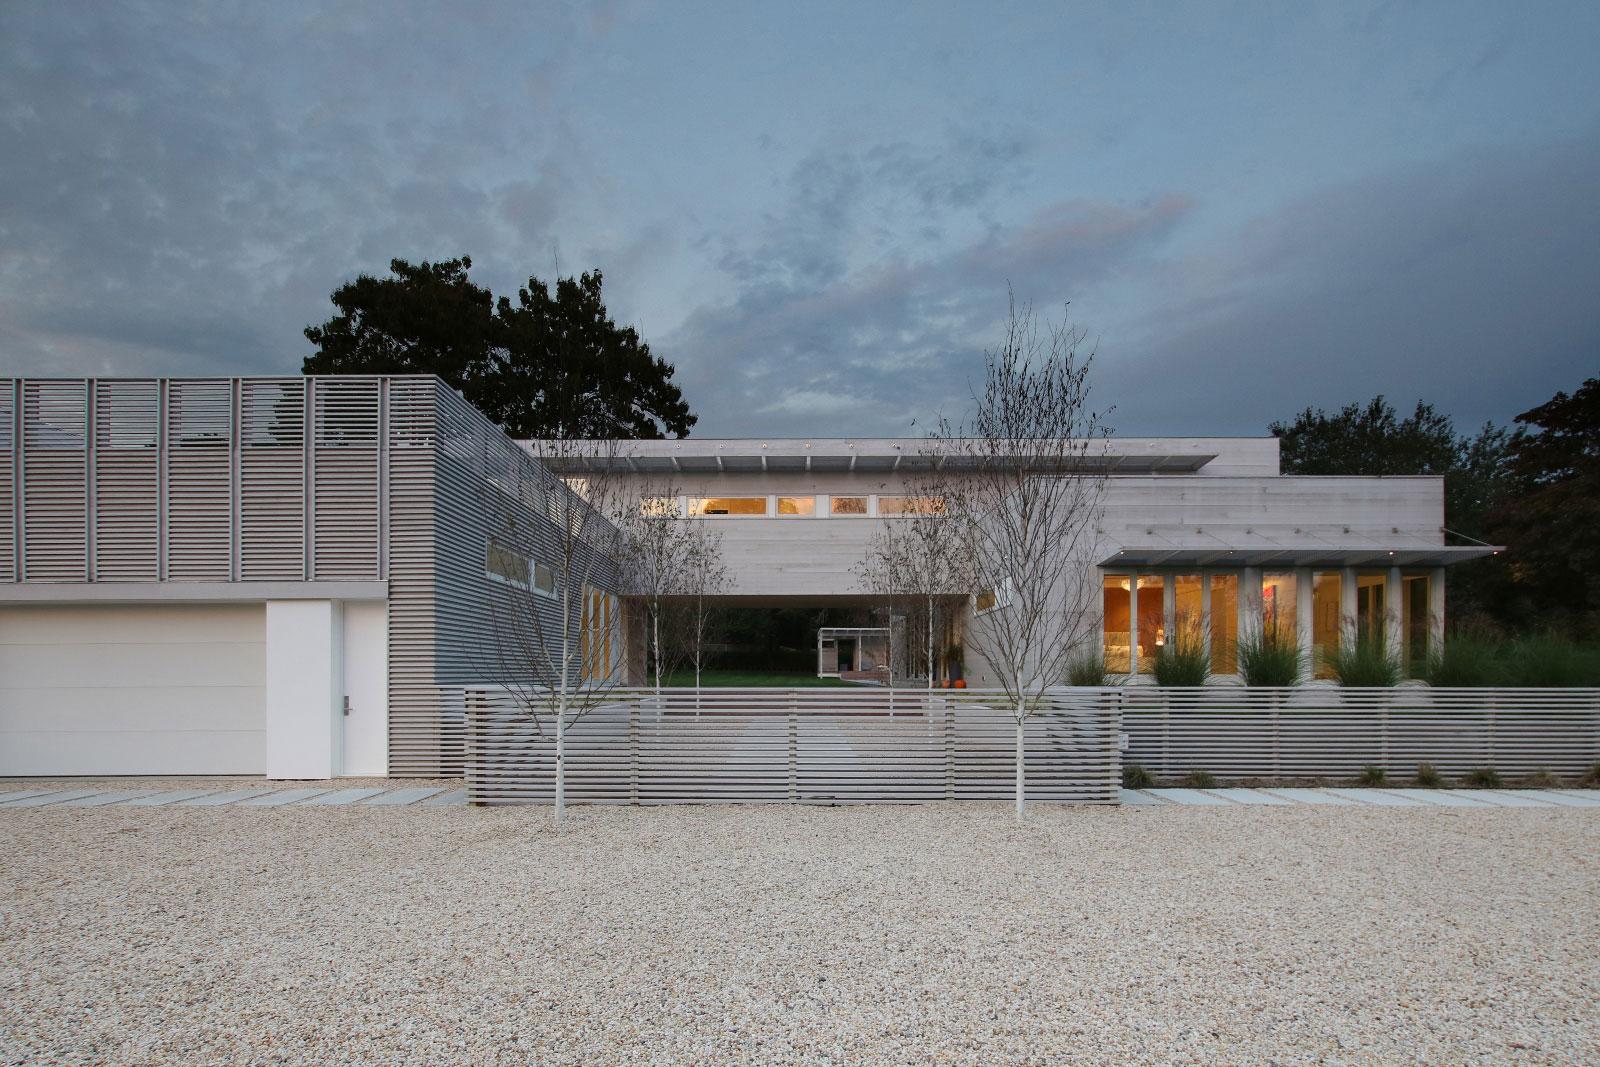 7-re4a-resolution-4-architecture-modern-modular-prefab-bridgehampton house-exterior-dusk.jpg